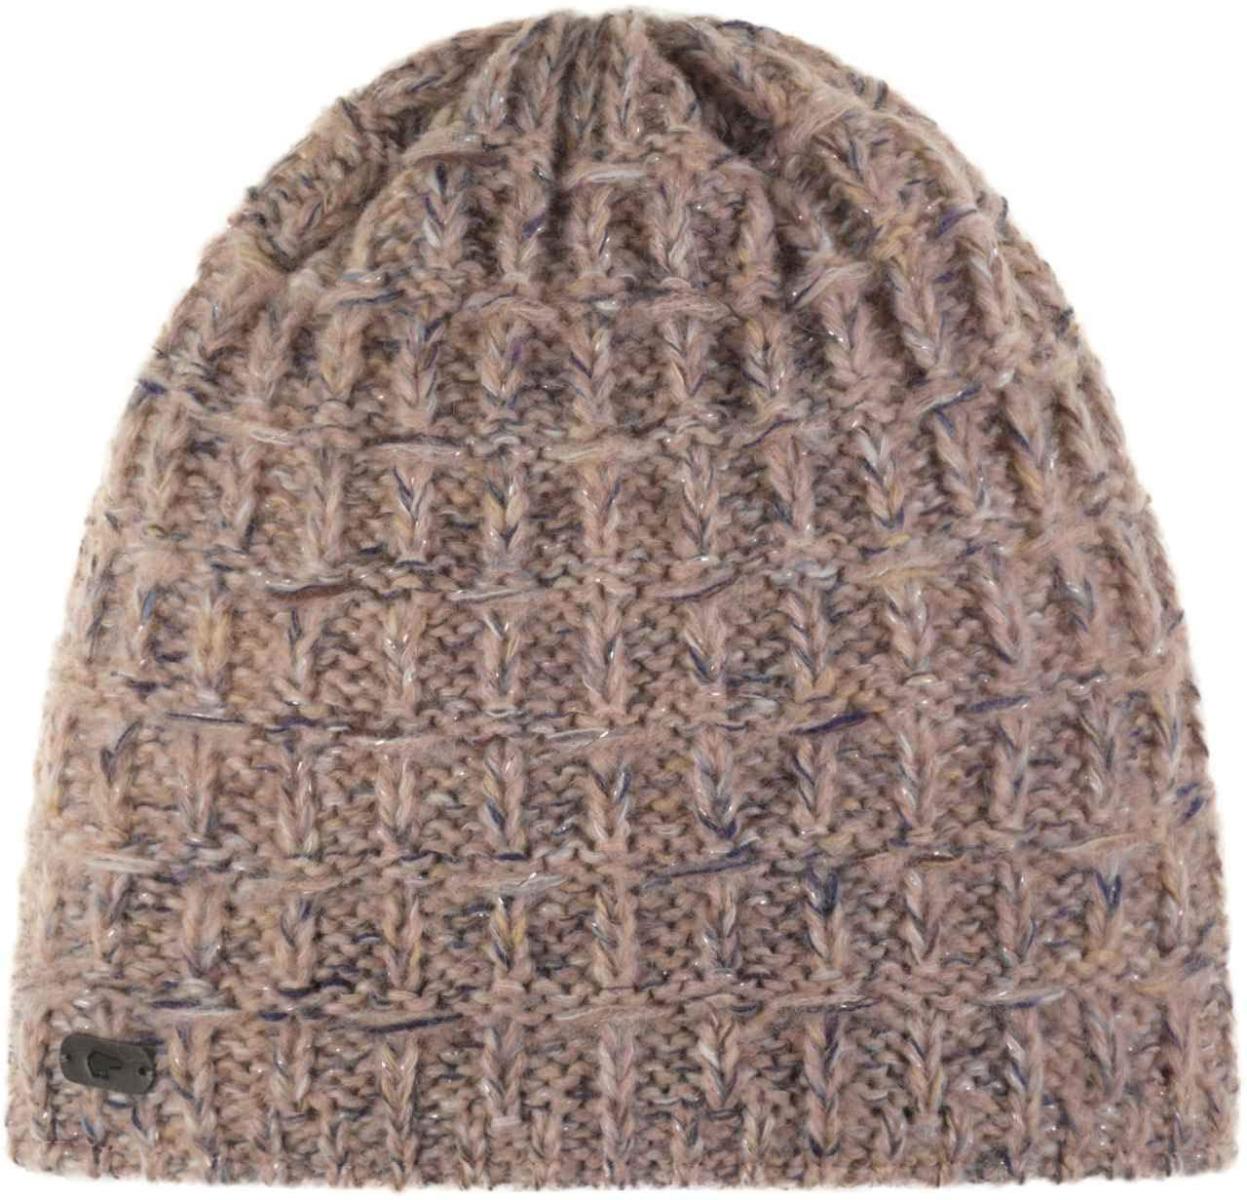 Eisbär Mütze Kaylinn OS 30657 Fb.777